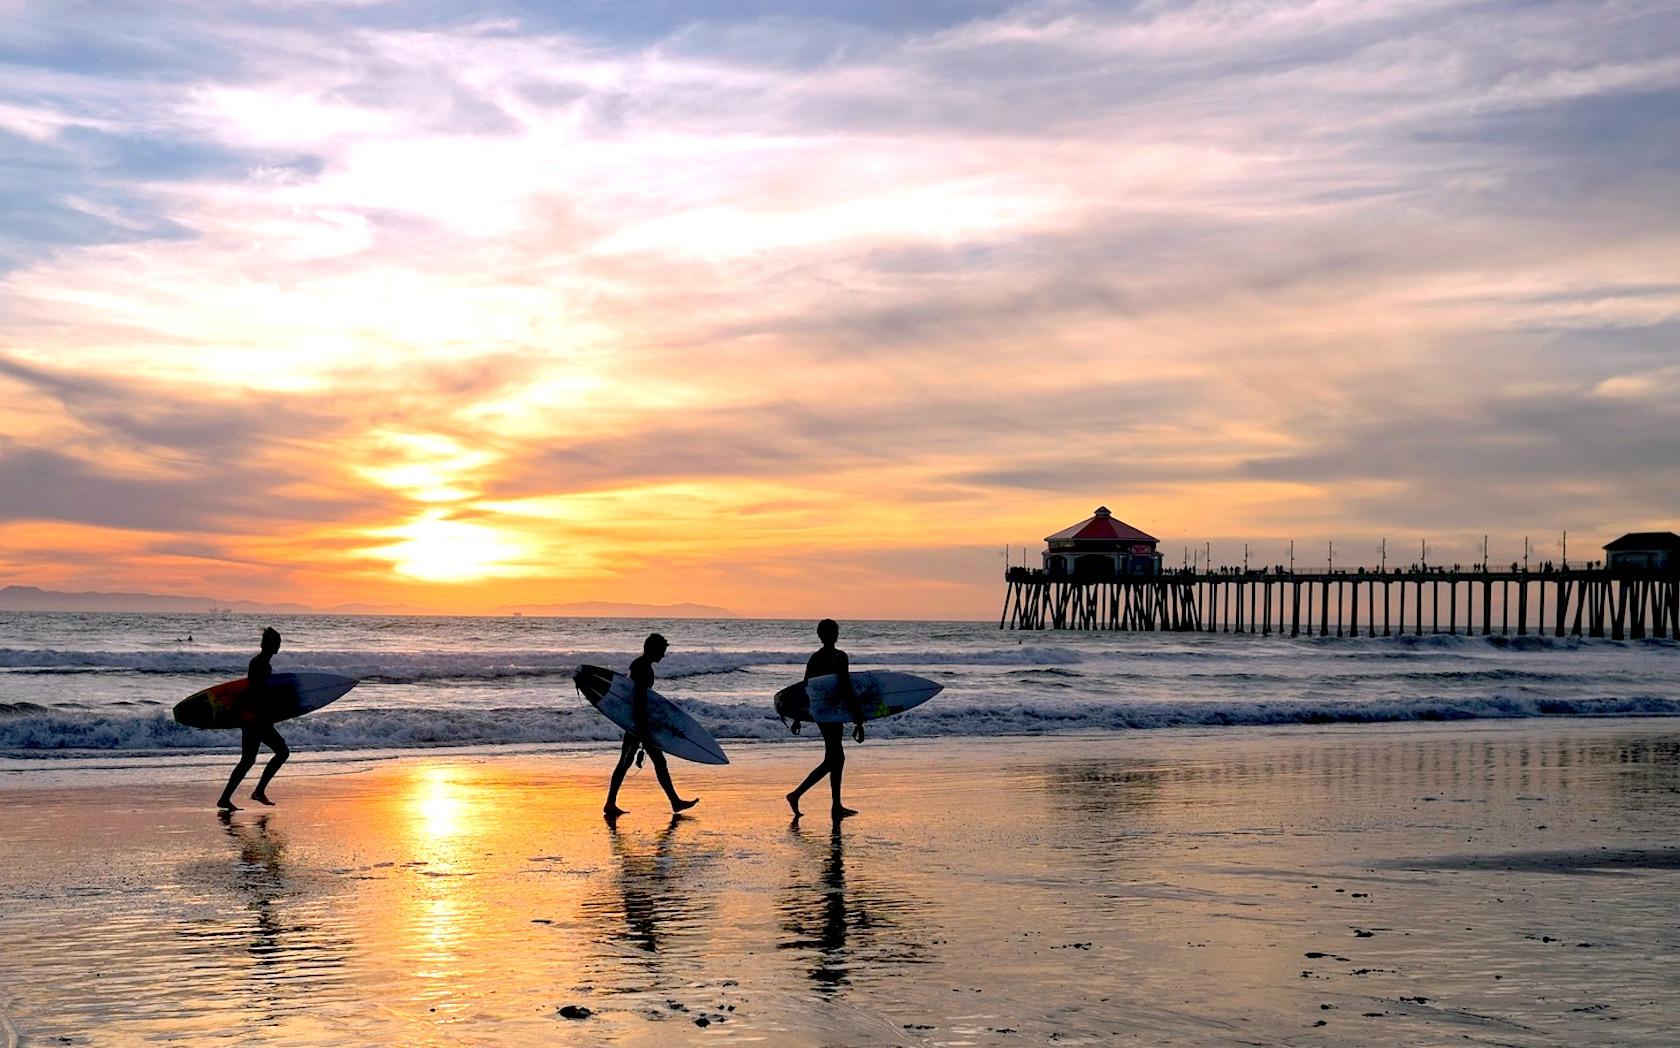 huntington-beach-pier.jpg